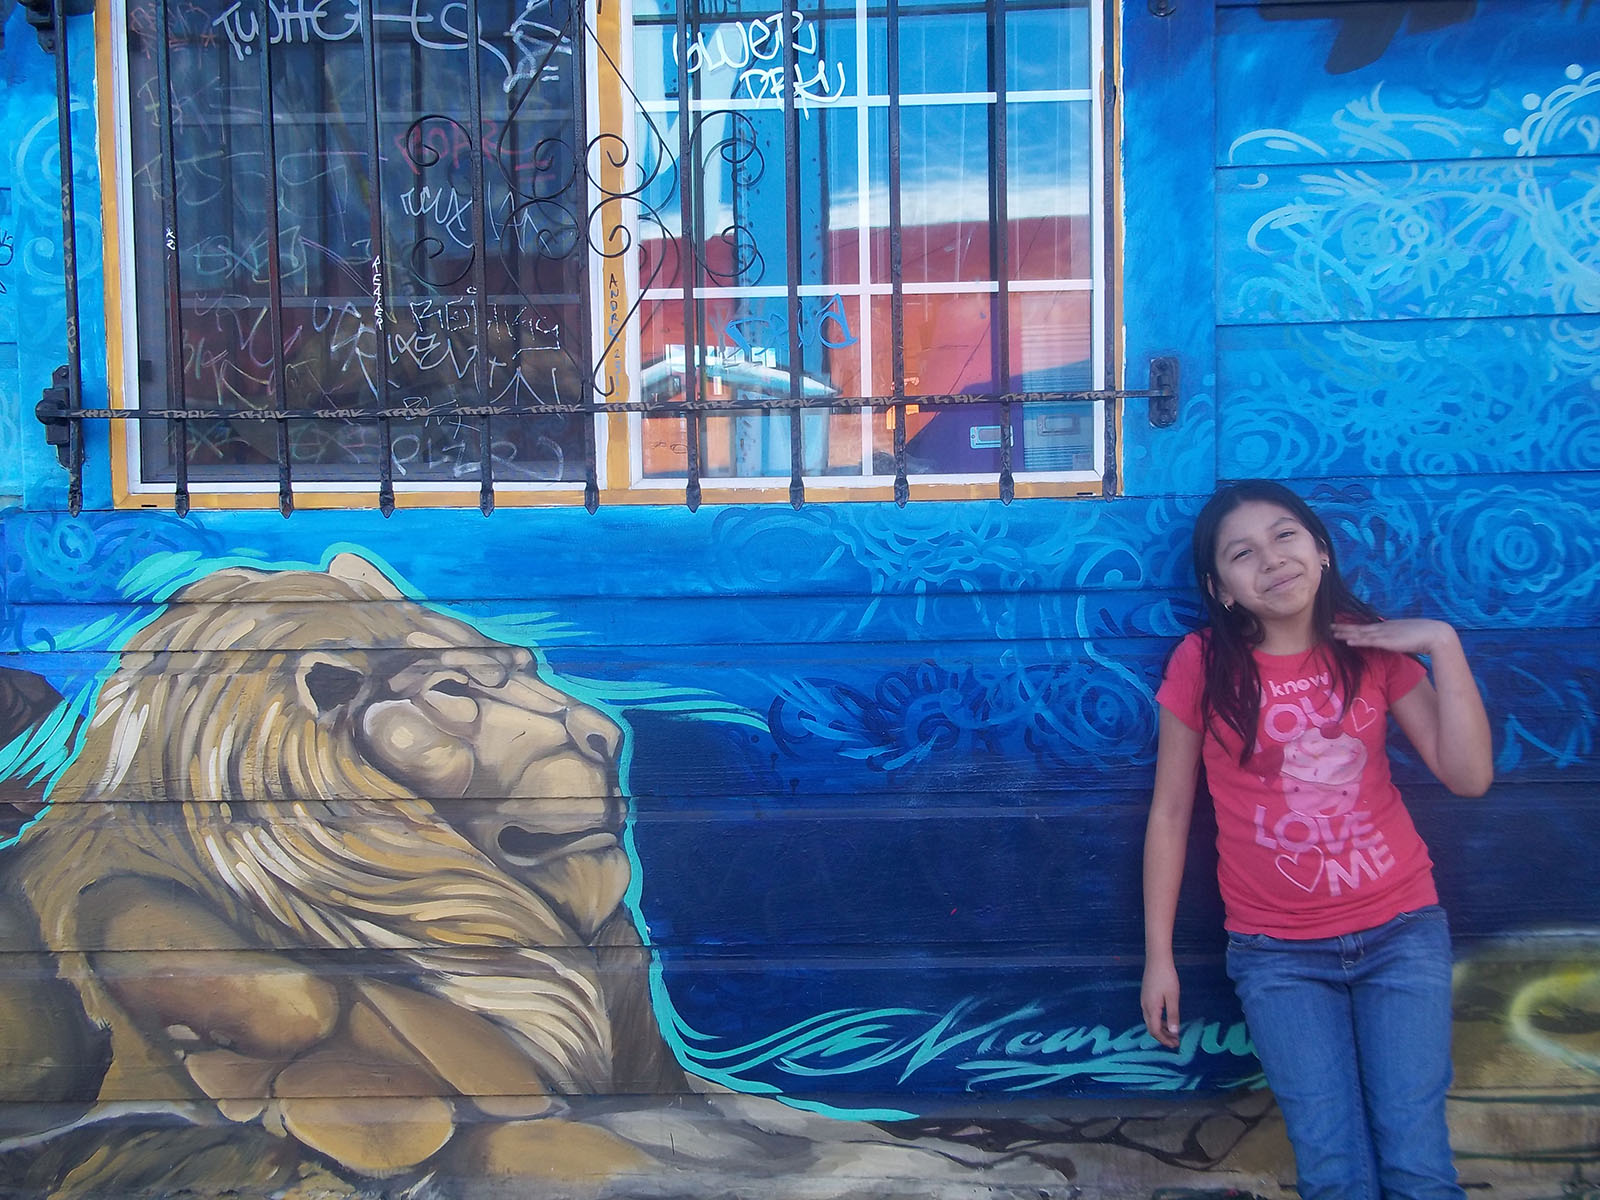 SNAP: Meet a Student from BVHM